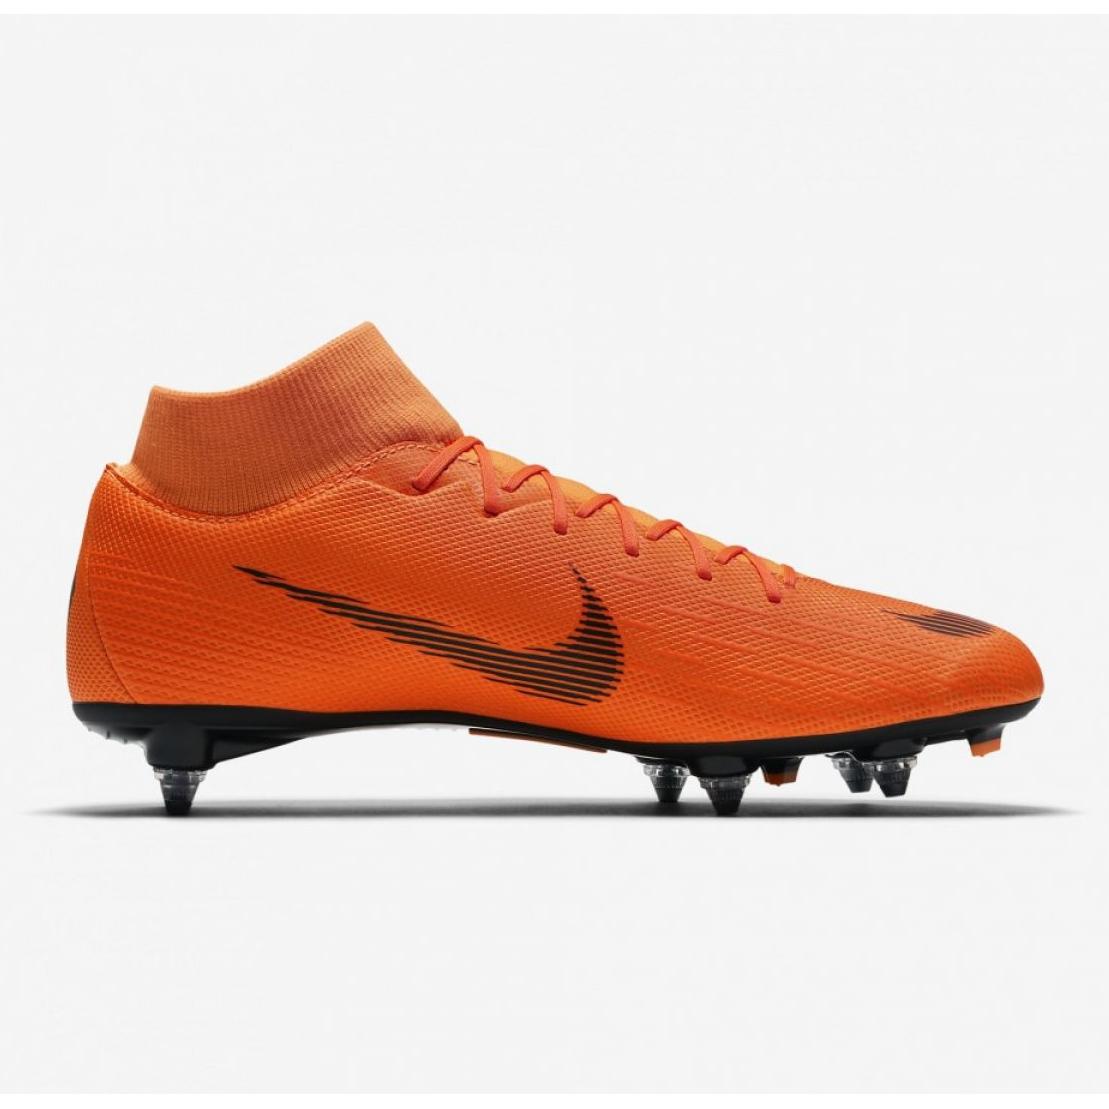 best website d23b2 069e8 Nike Mercurial Superfly 6 Academy Sg Pro M AH7364-810 Football Shoes